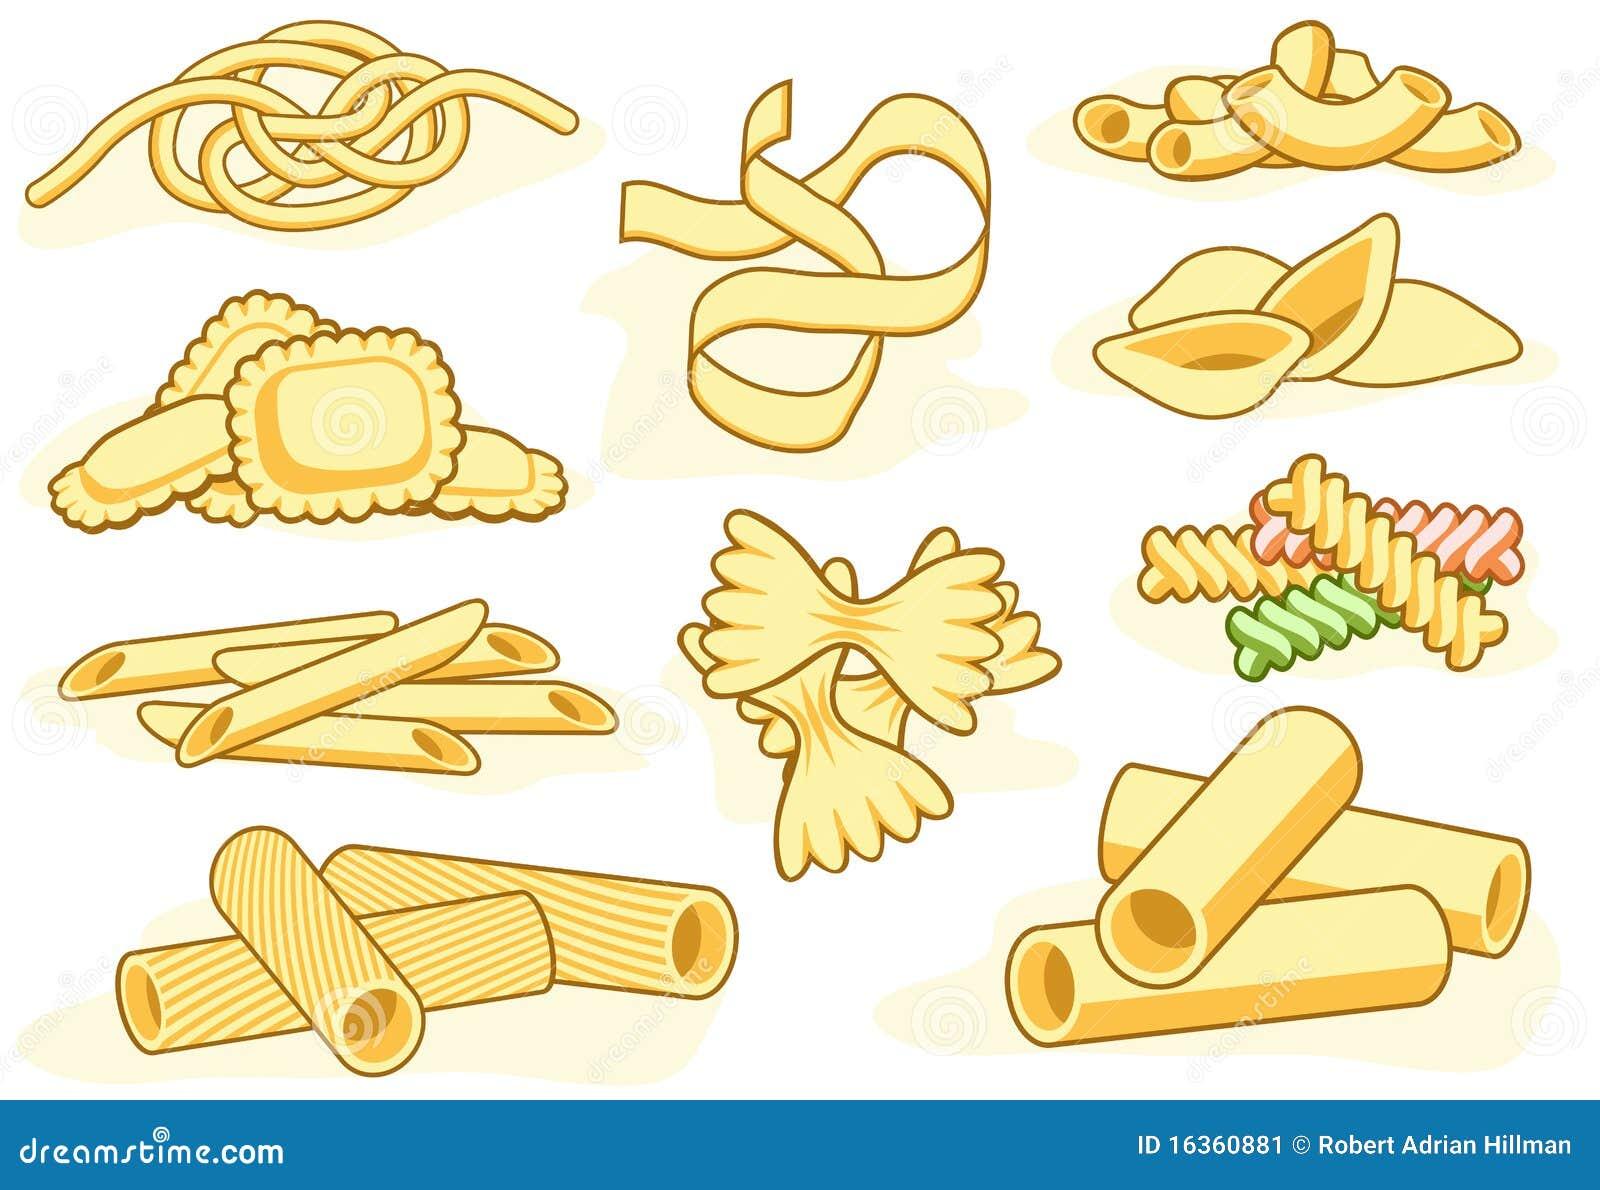 How To Make Pasta Shapes  Jamies Comfort Food  Gennaro